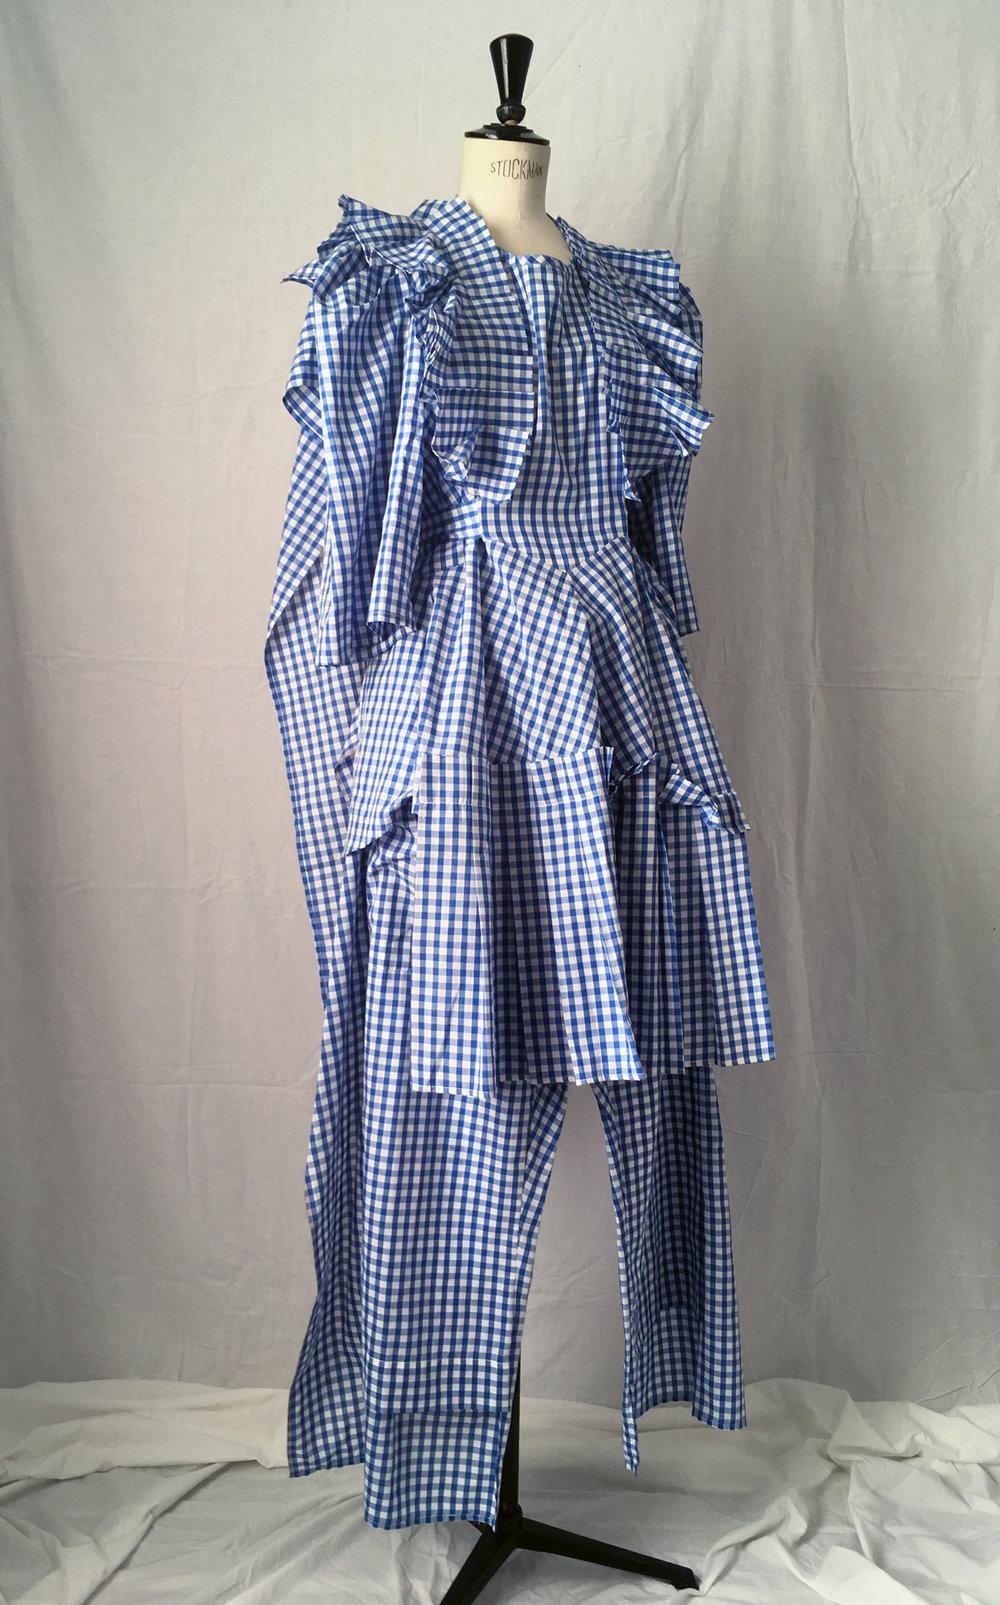 DRESS LTD Dorothy's Pyjamas Set 1: HALF APRON DOROTHY Dress & FLAT PACK PYJAMA Trousers - detail - #dressltd